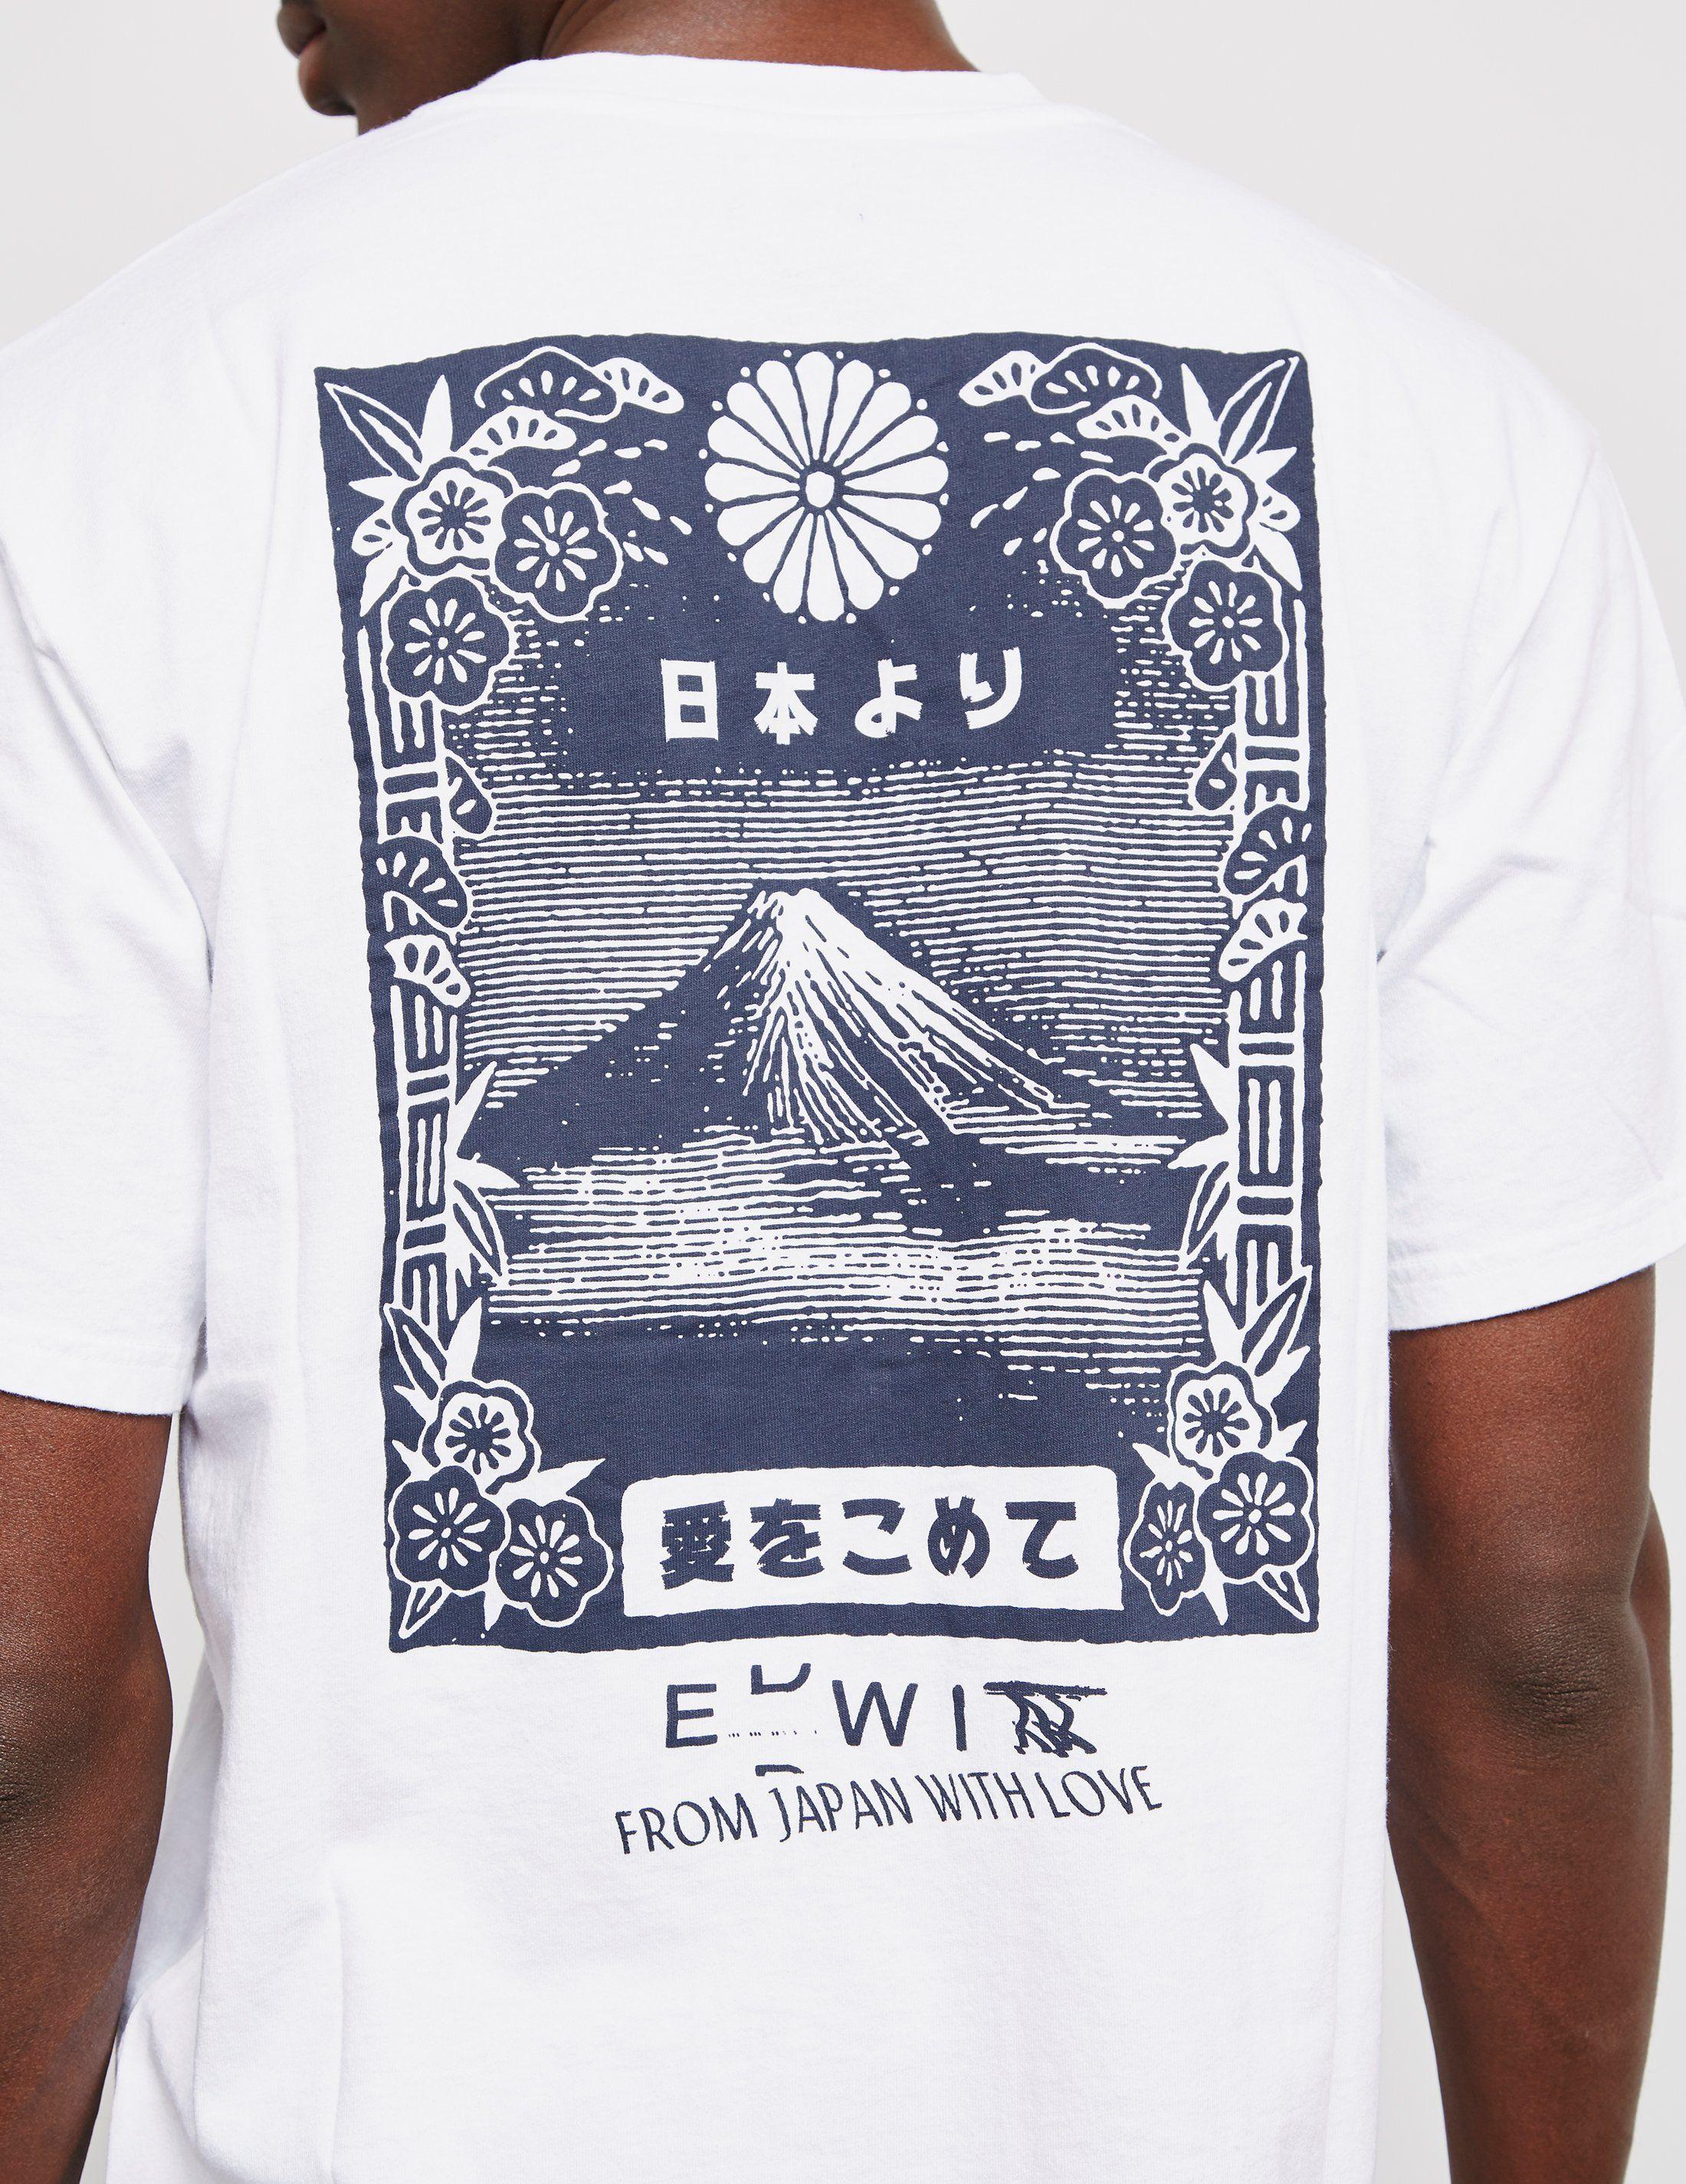 Edwin Mt Fuji Short Sleeve T-Shirt - Online Exclusive